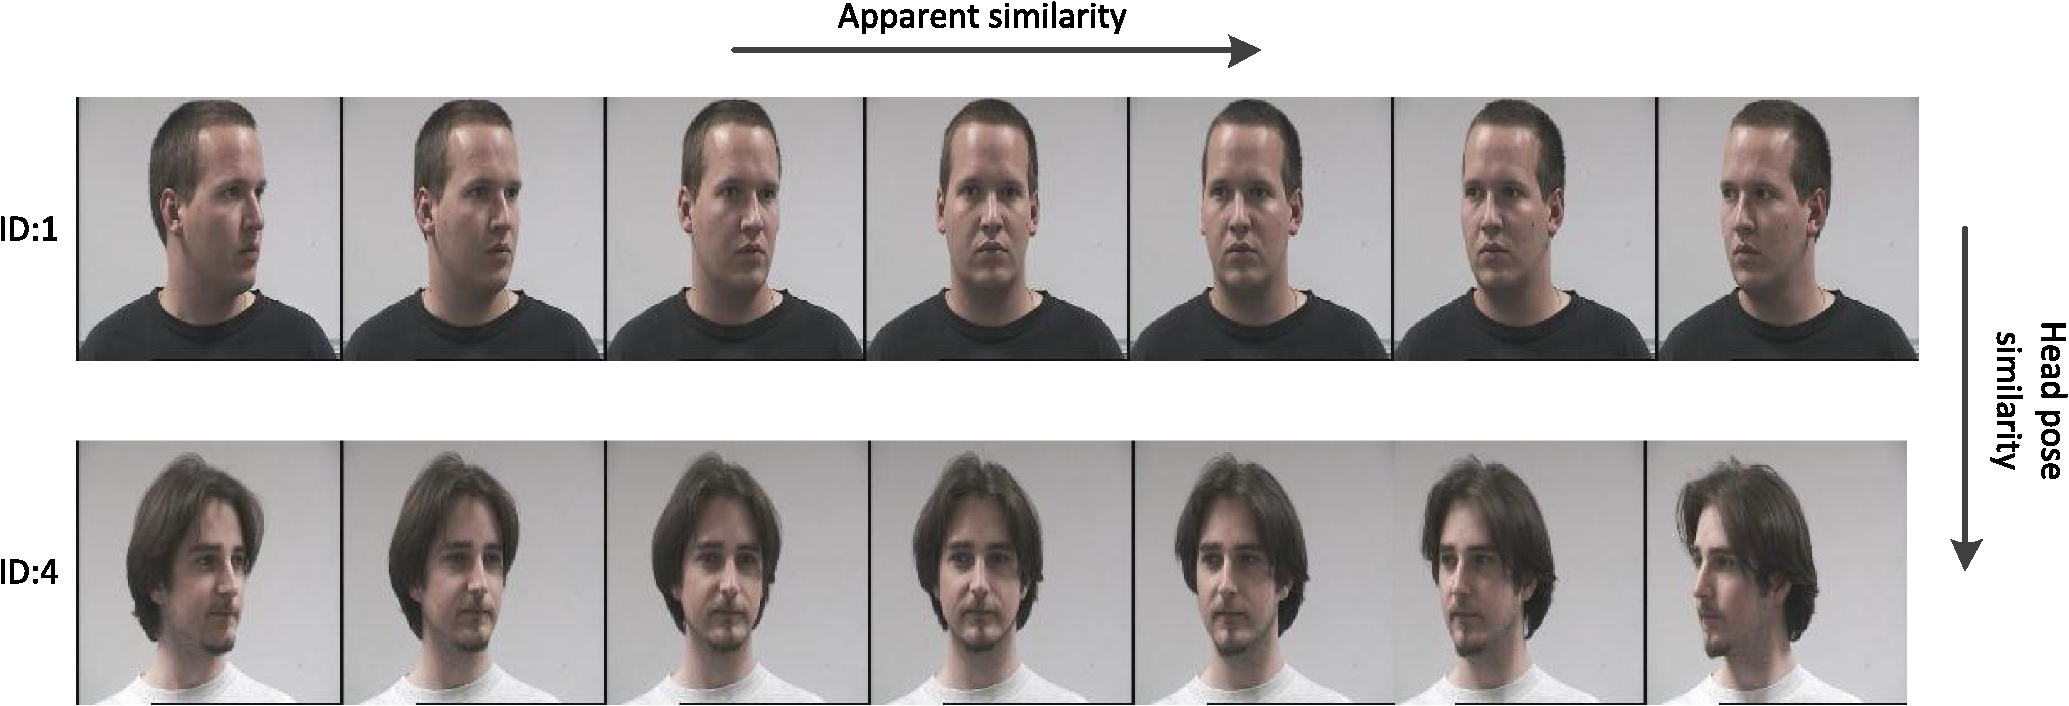 Head Pose Estimation Using Deep Multitask Learning